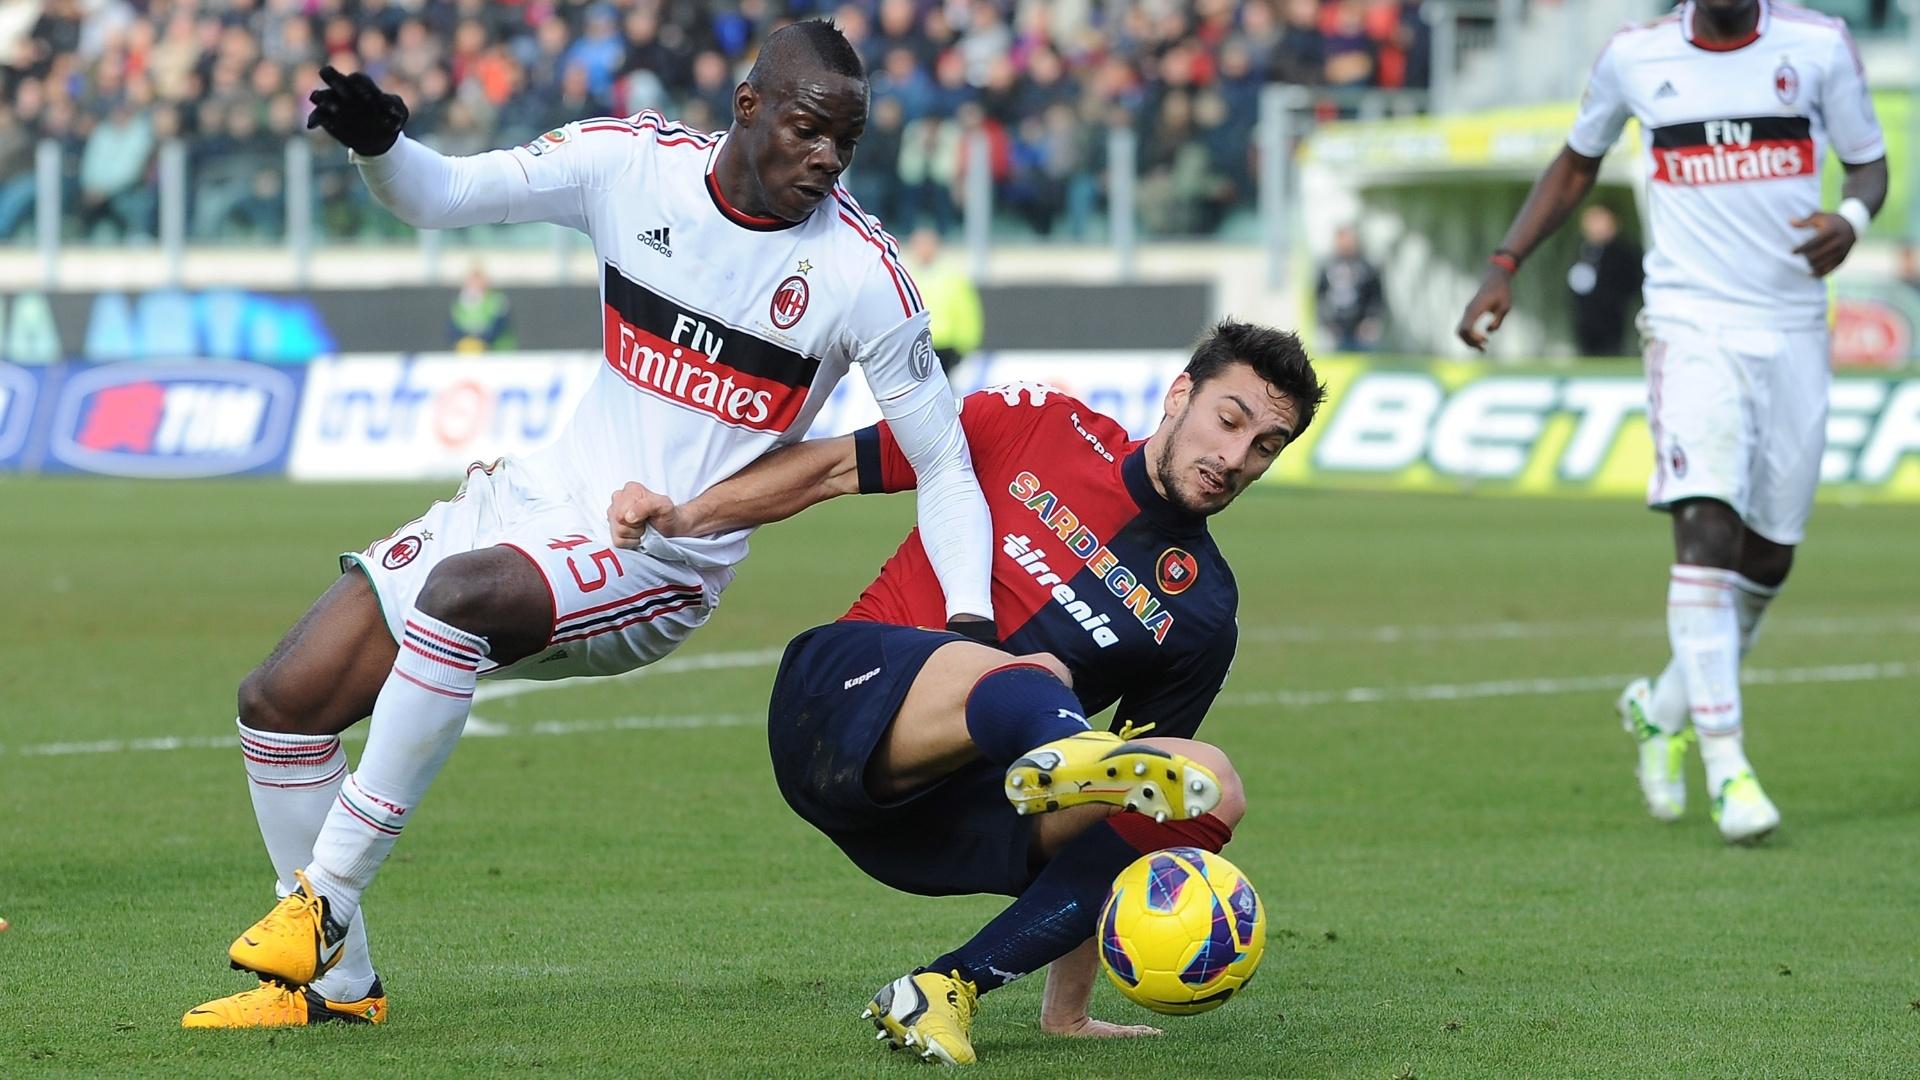 10.fev.2013 - Atacante Mario Balotelli (esq), do Milan, disputa bola com Davide Astori, do Cagliari, durante empate por 1 a 1 pelo Campeonato Italiano